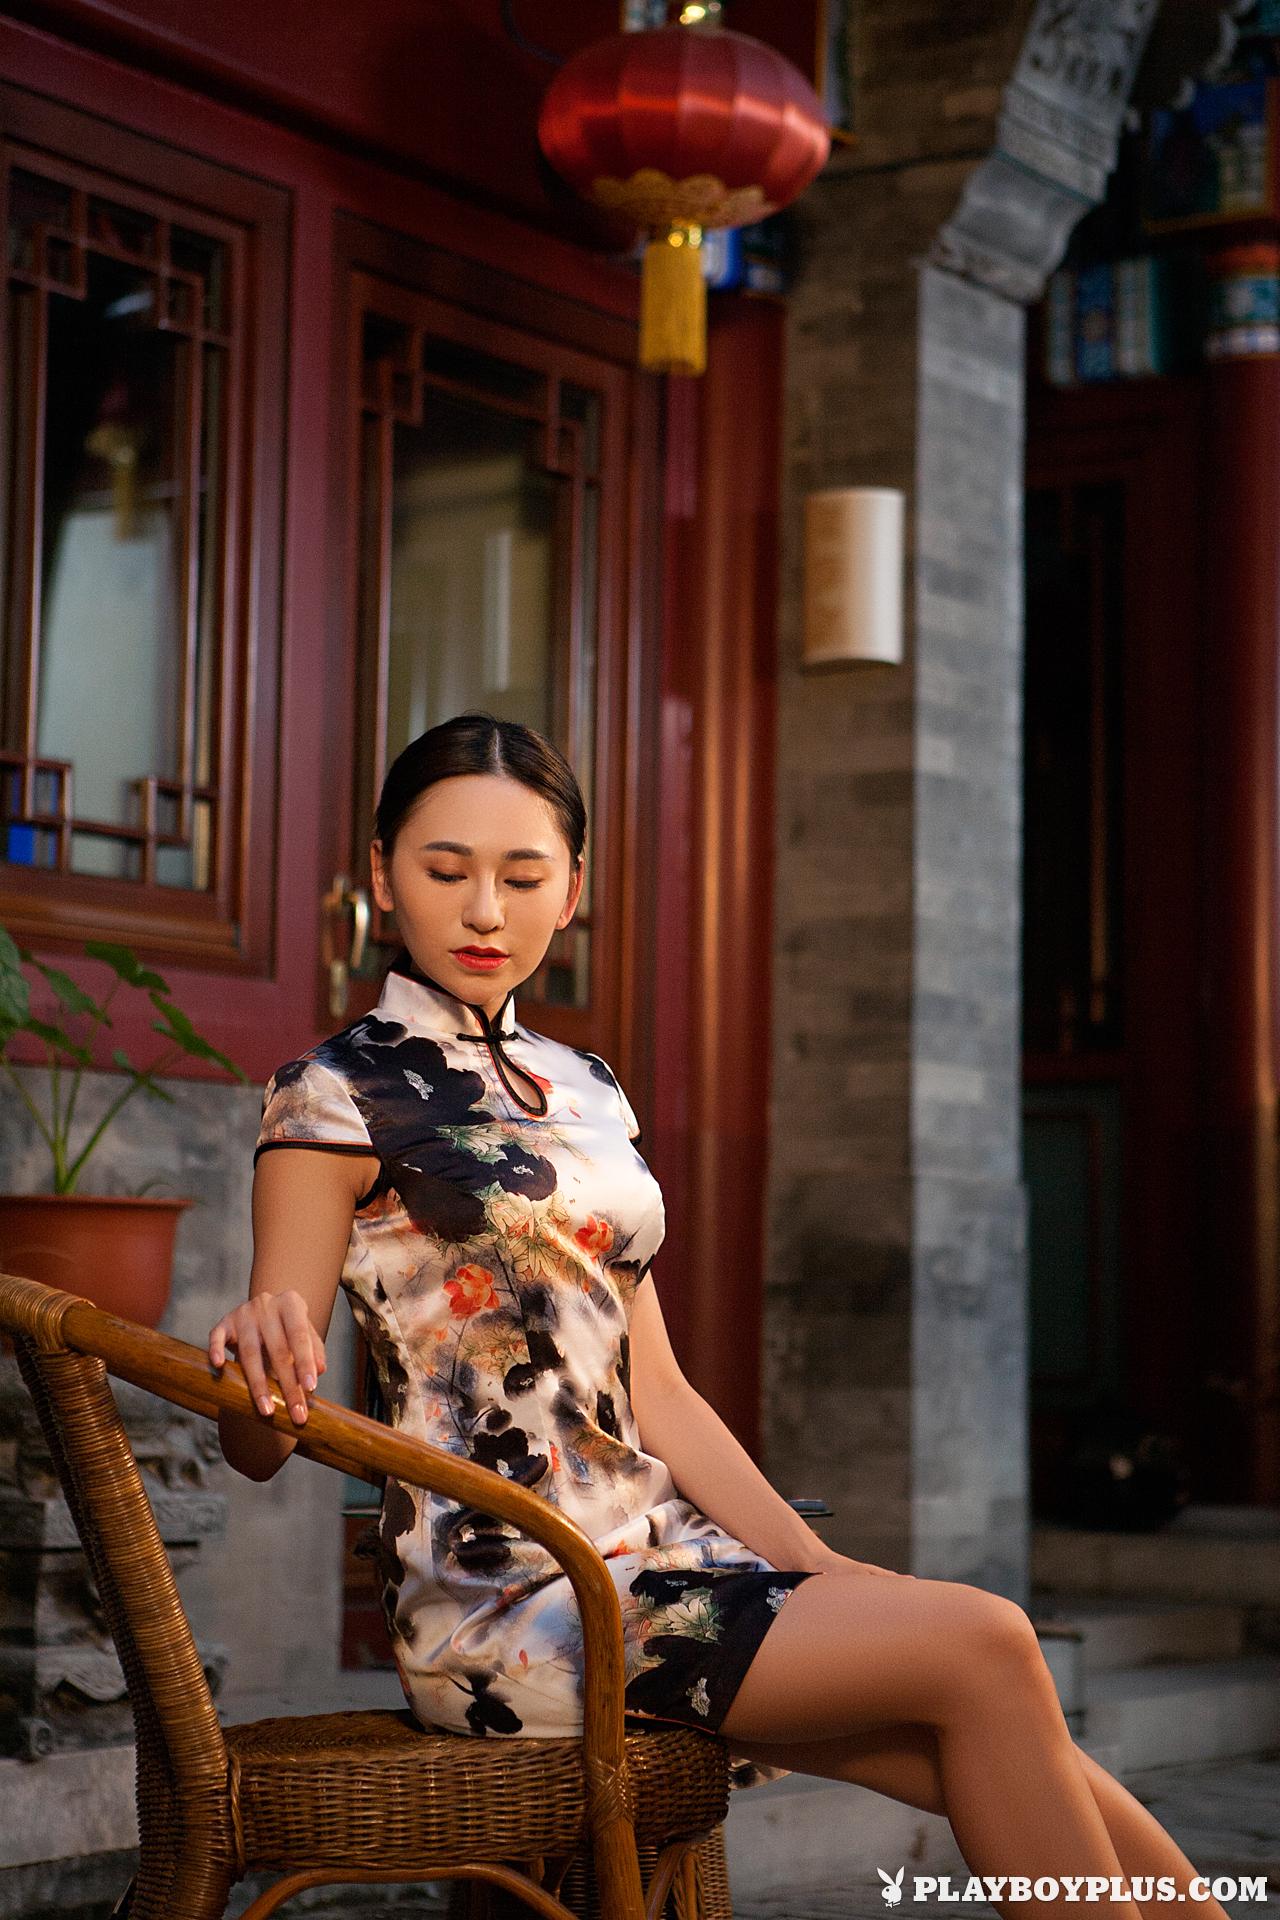 wu-muxi-nude-chinese-girl-short-dress-playboy-03